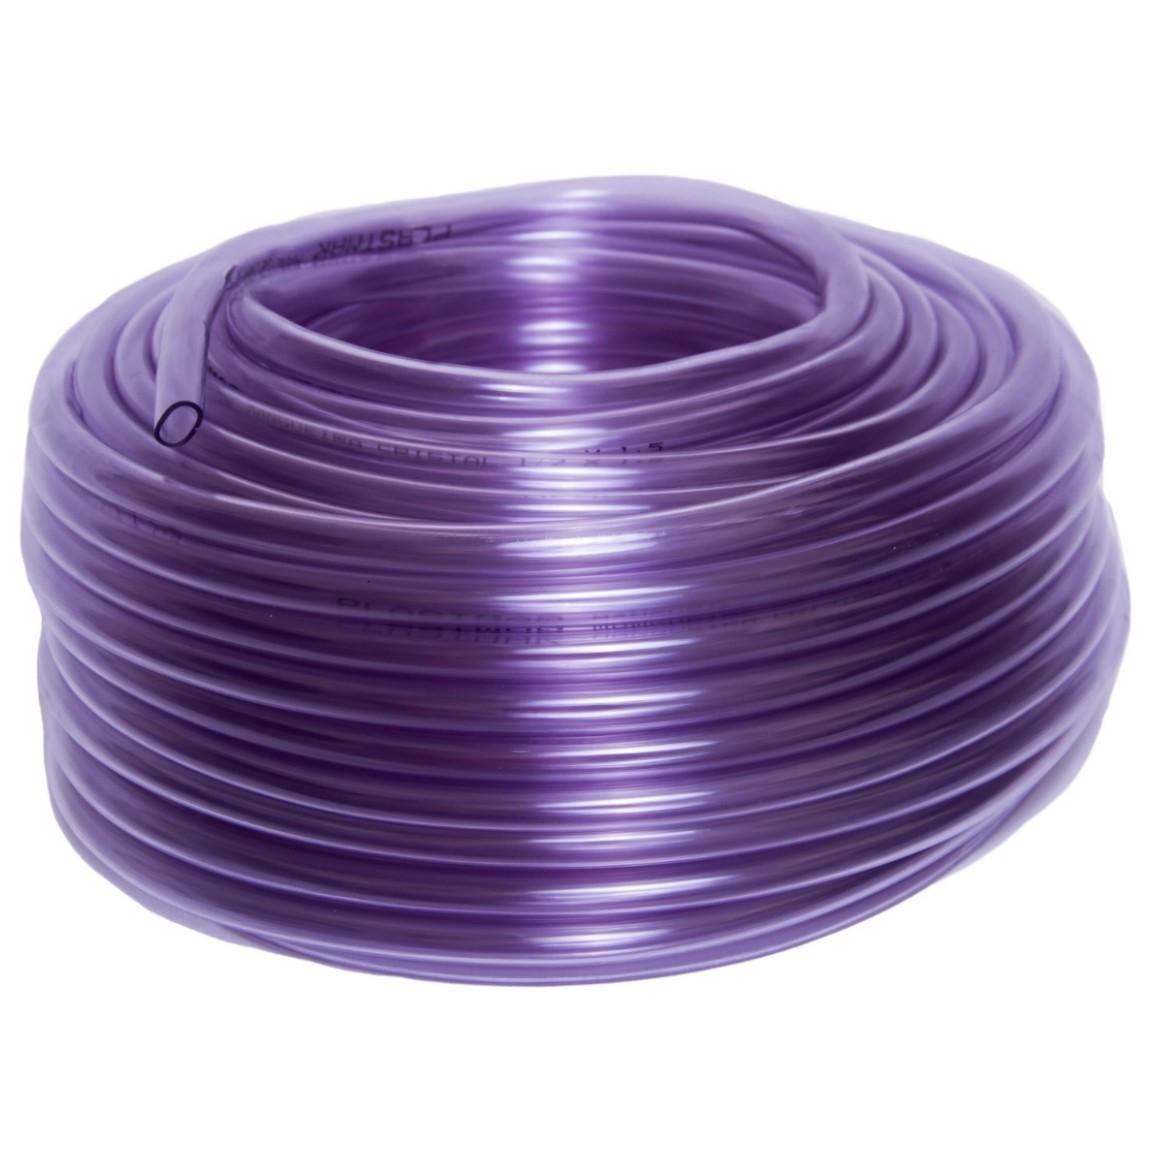 Mangueira de PVC 10m 34 Roxa 808 - Plastmar